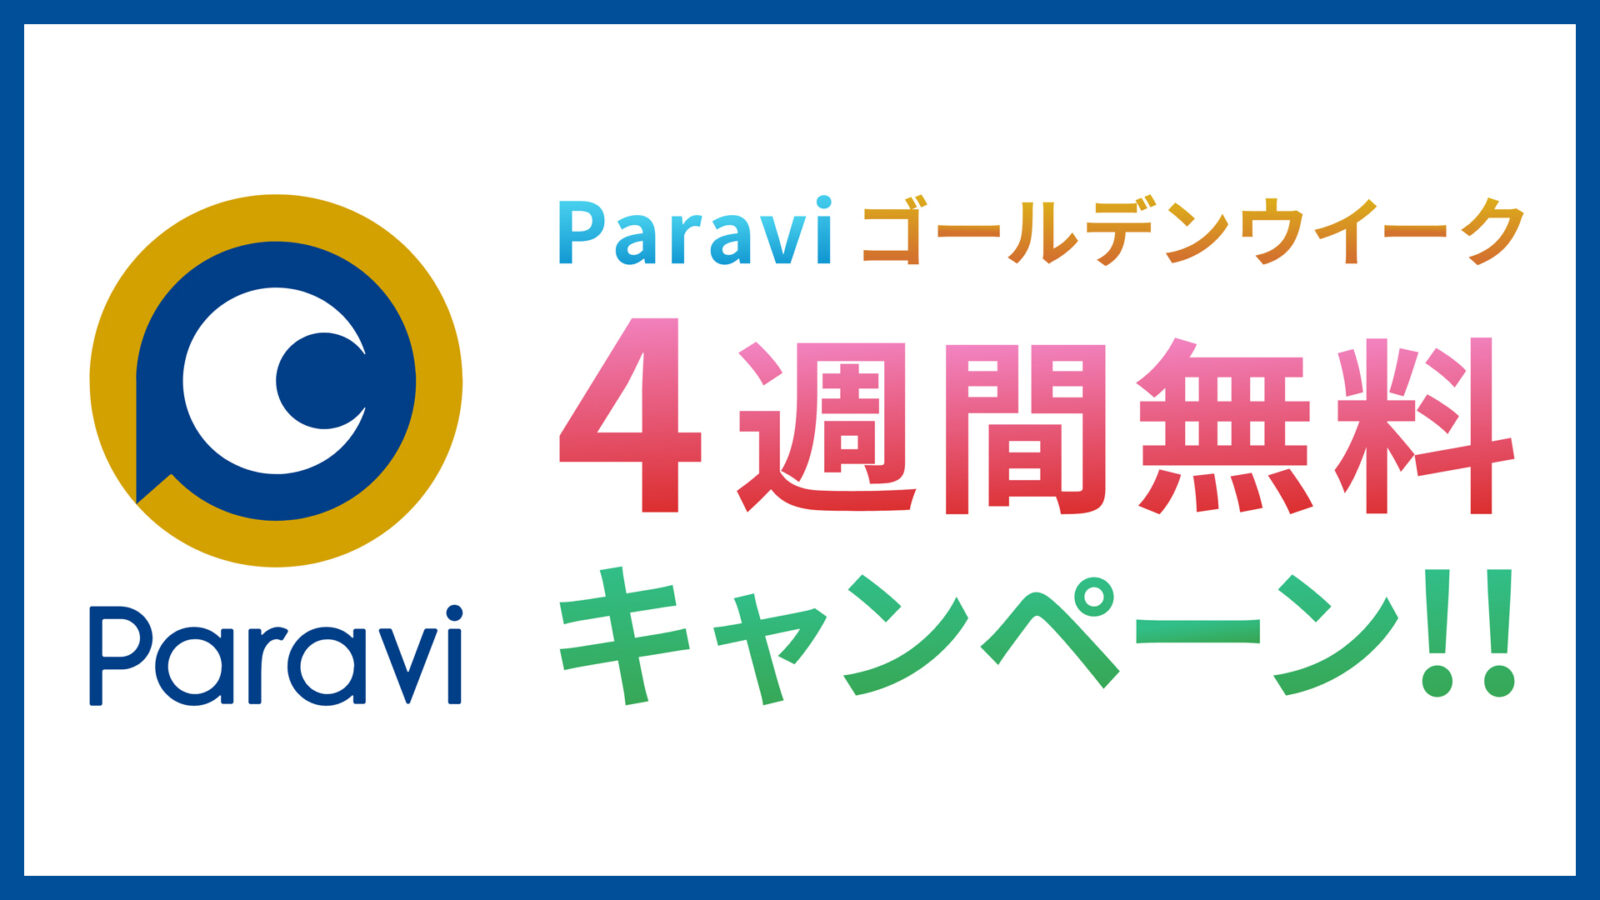 Paraviゴールデンウィーク4週間無料キャンペーン!!